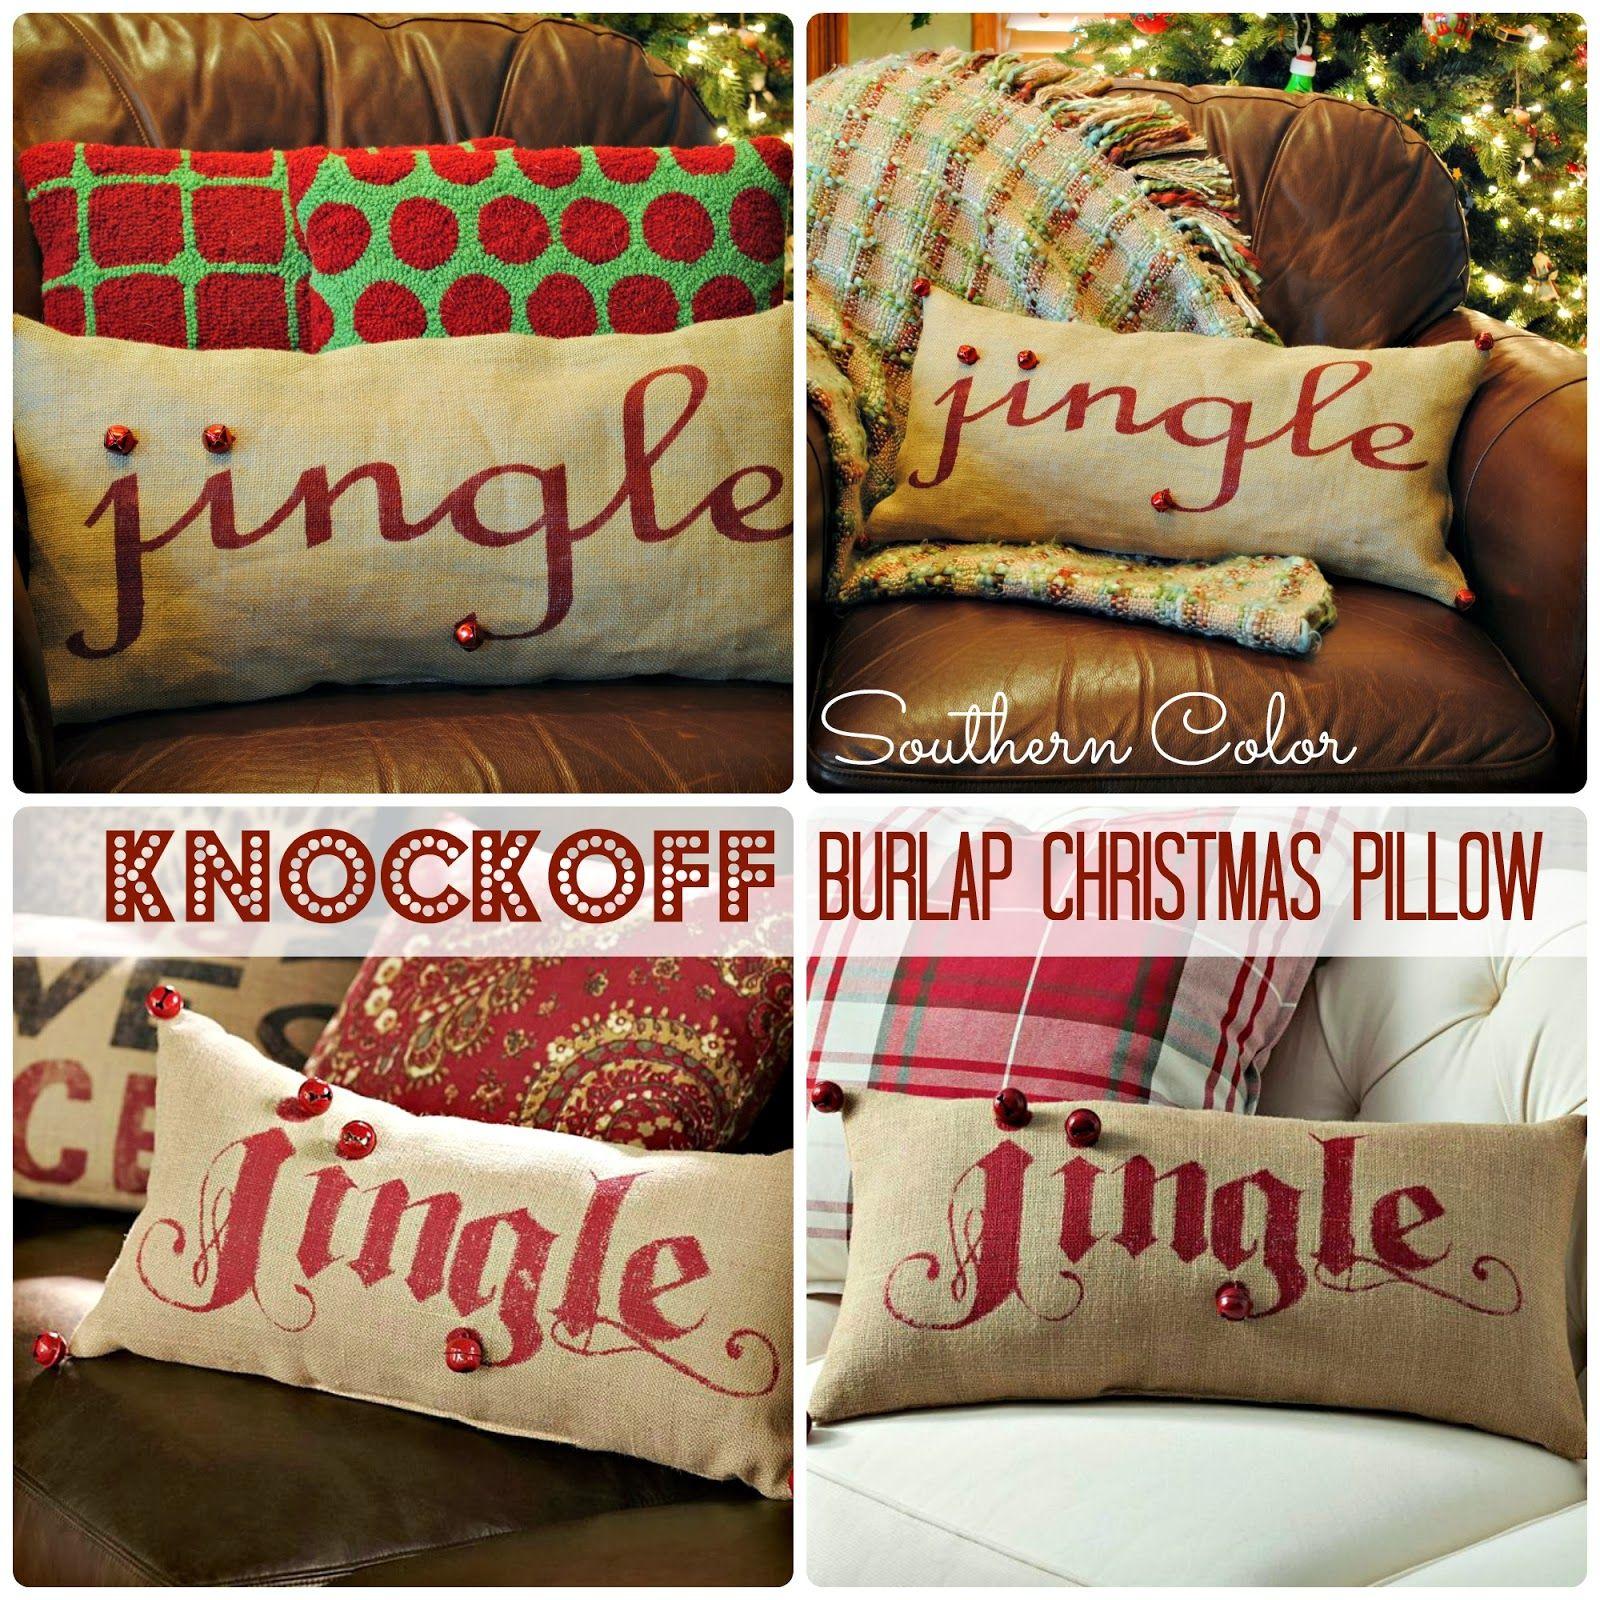 Knock Off Burlap Pillow Southerncolor Christmas Burlap